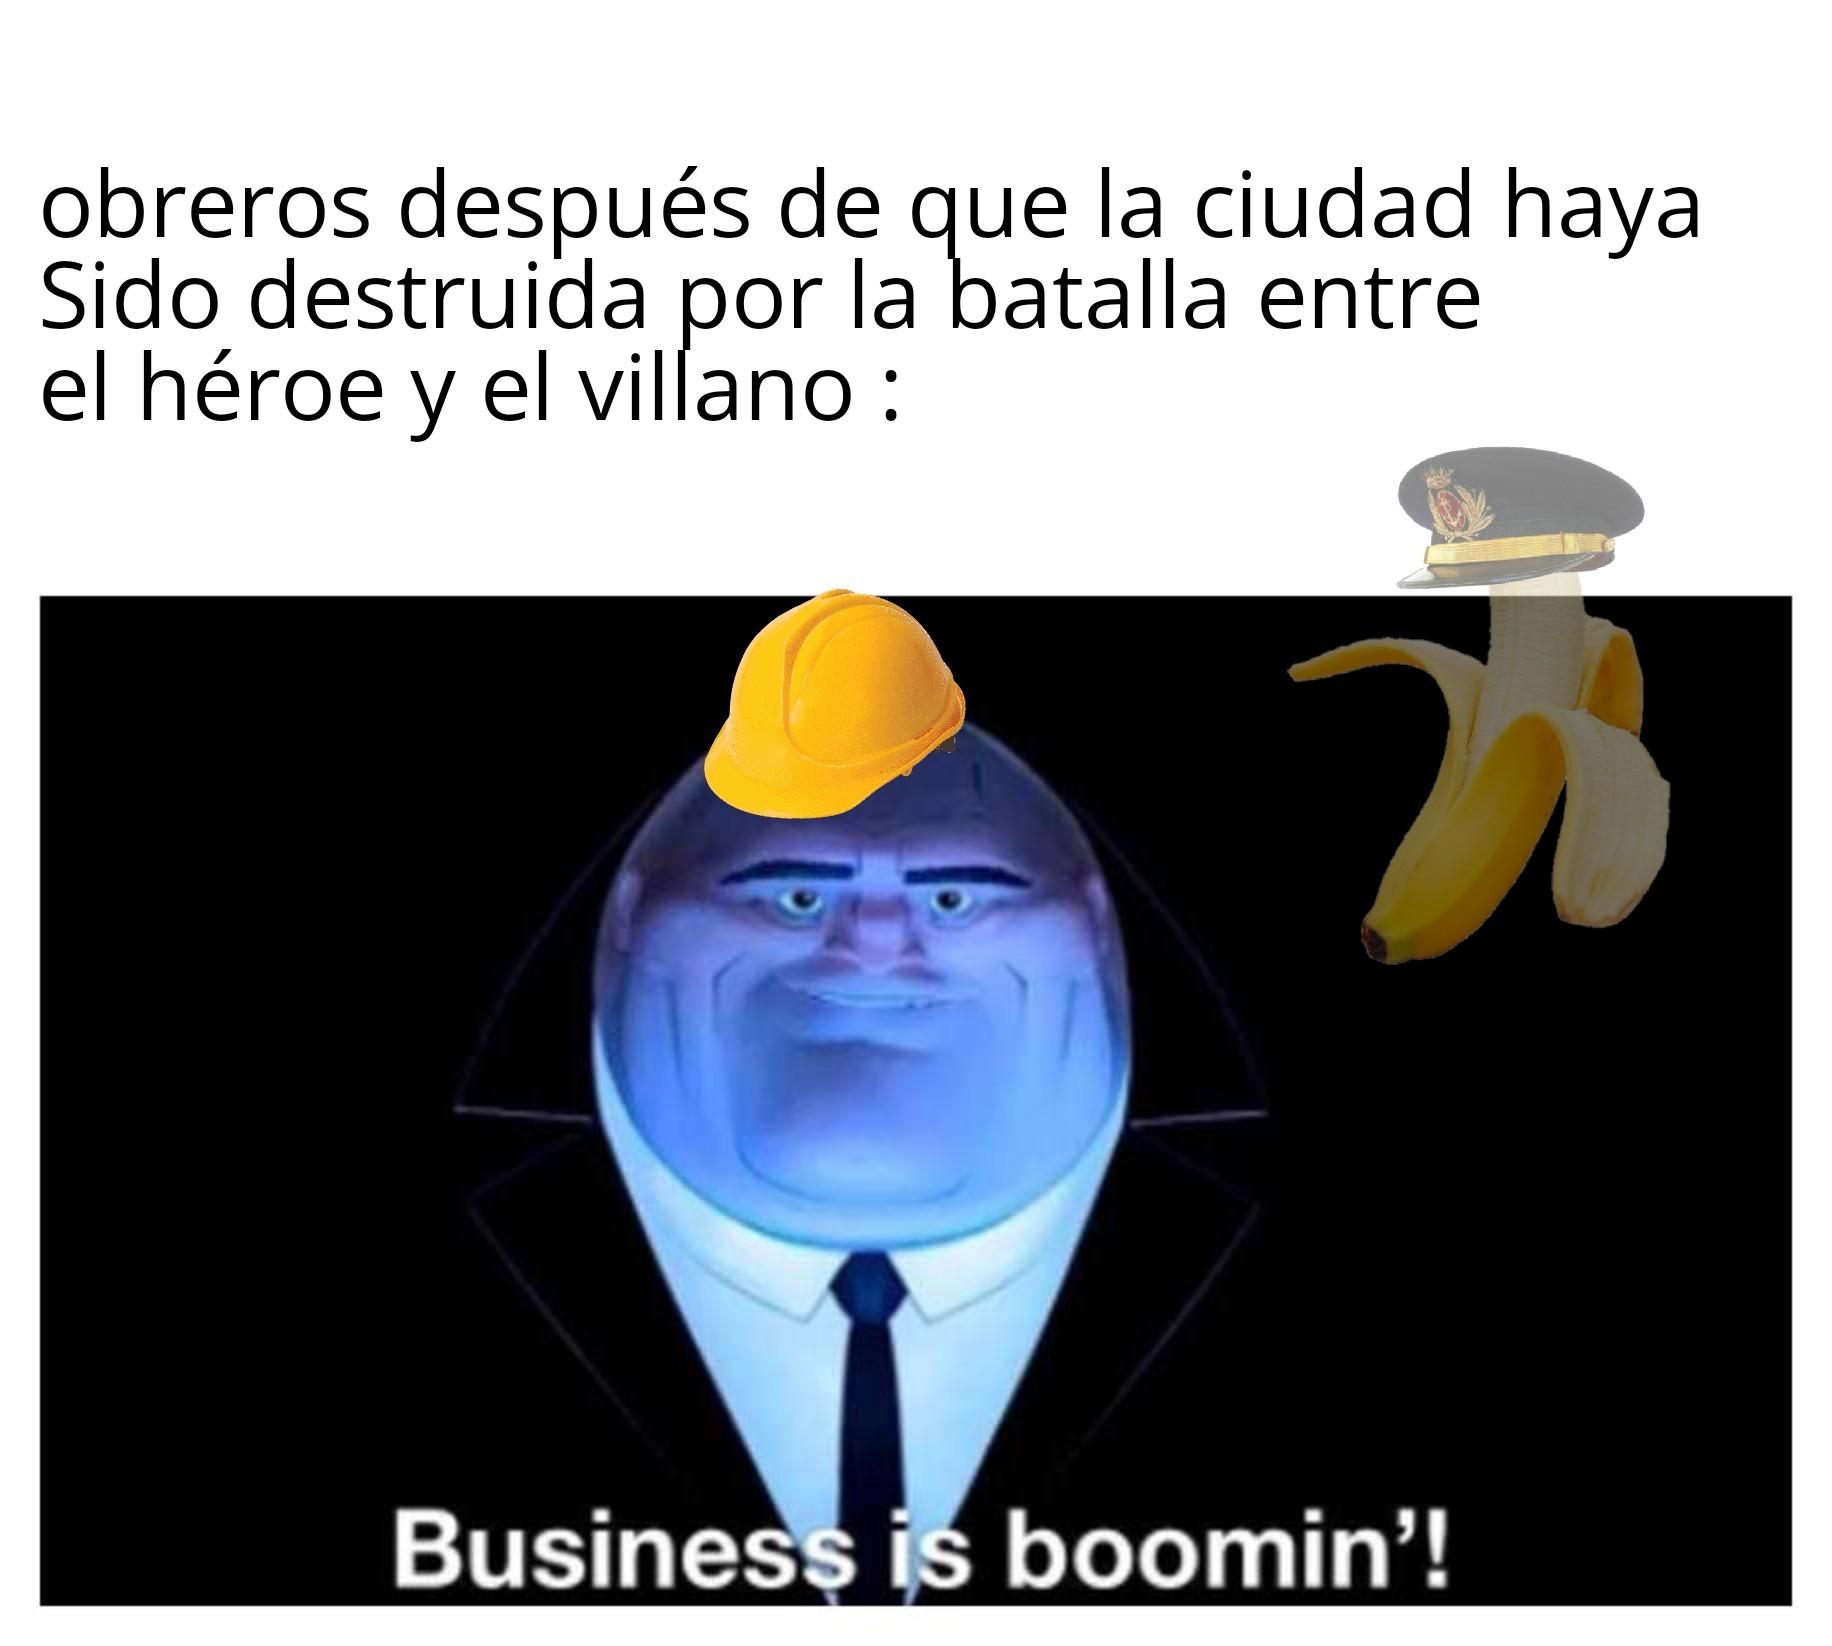 Sindicatos : stonks - meme